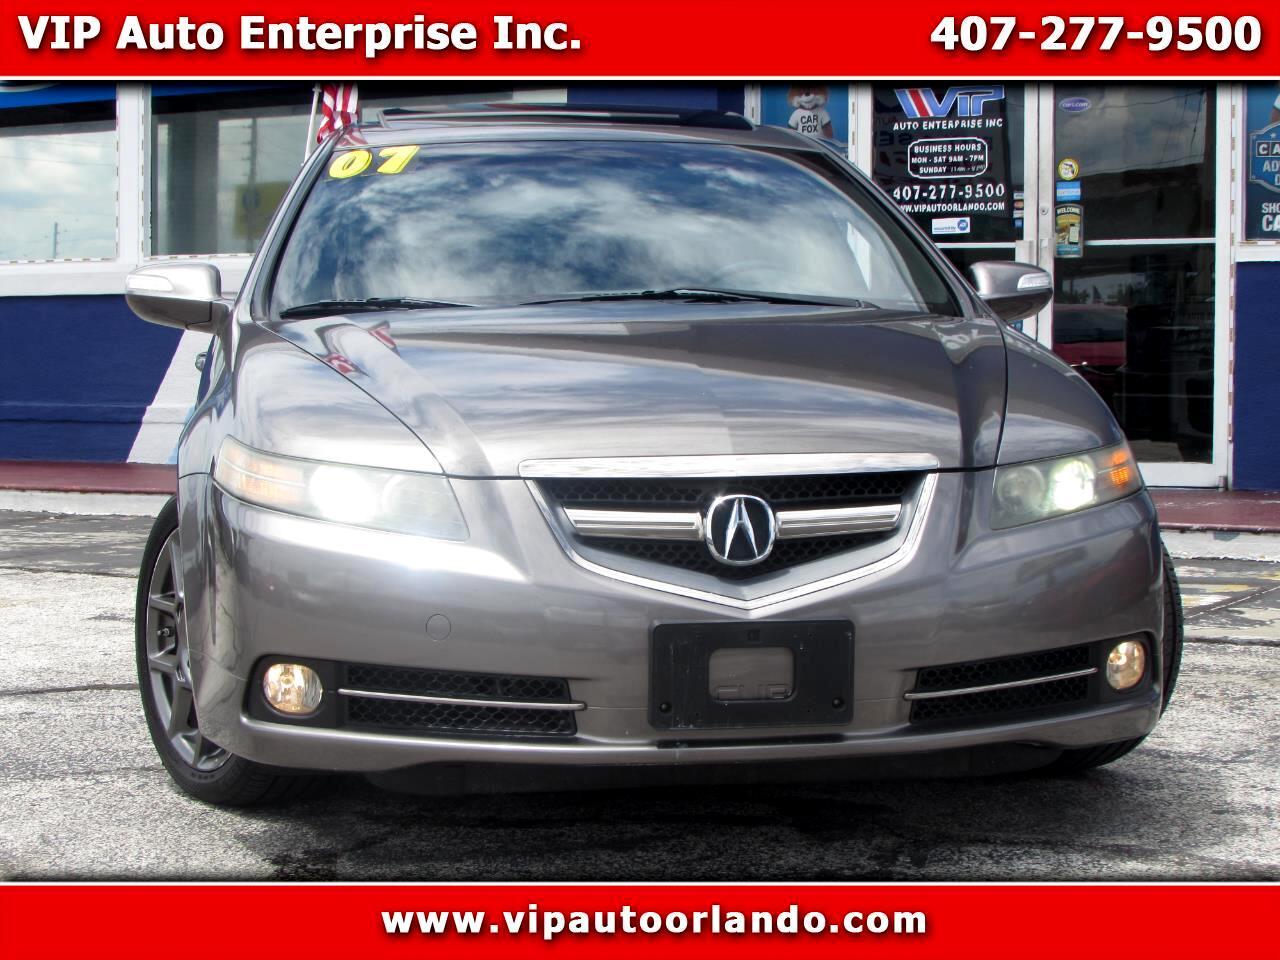 Used Cars for Sale Orlando FL 32807 VIP Auto Enterprise Inc